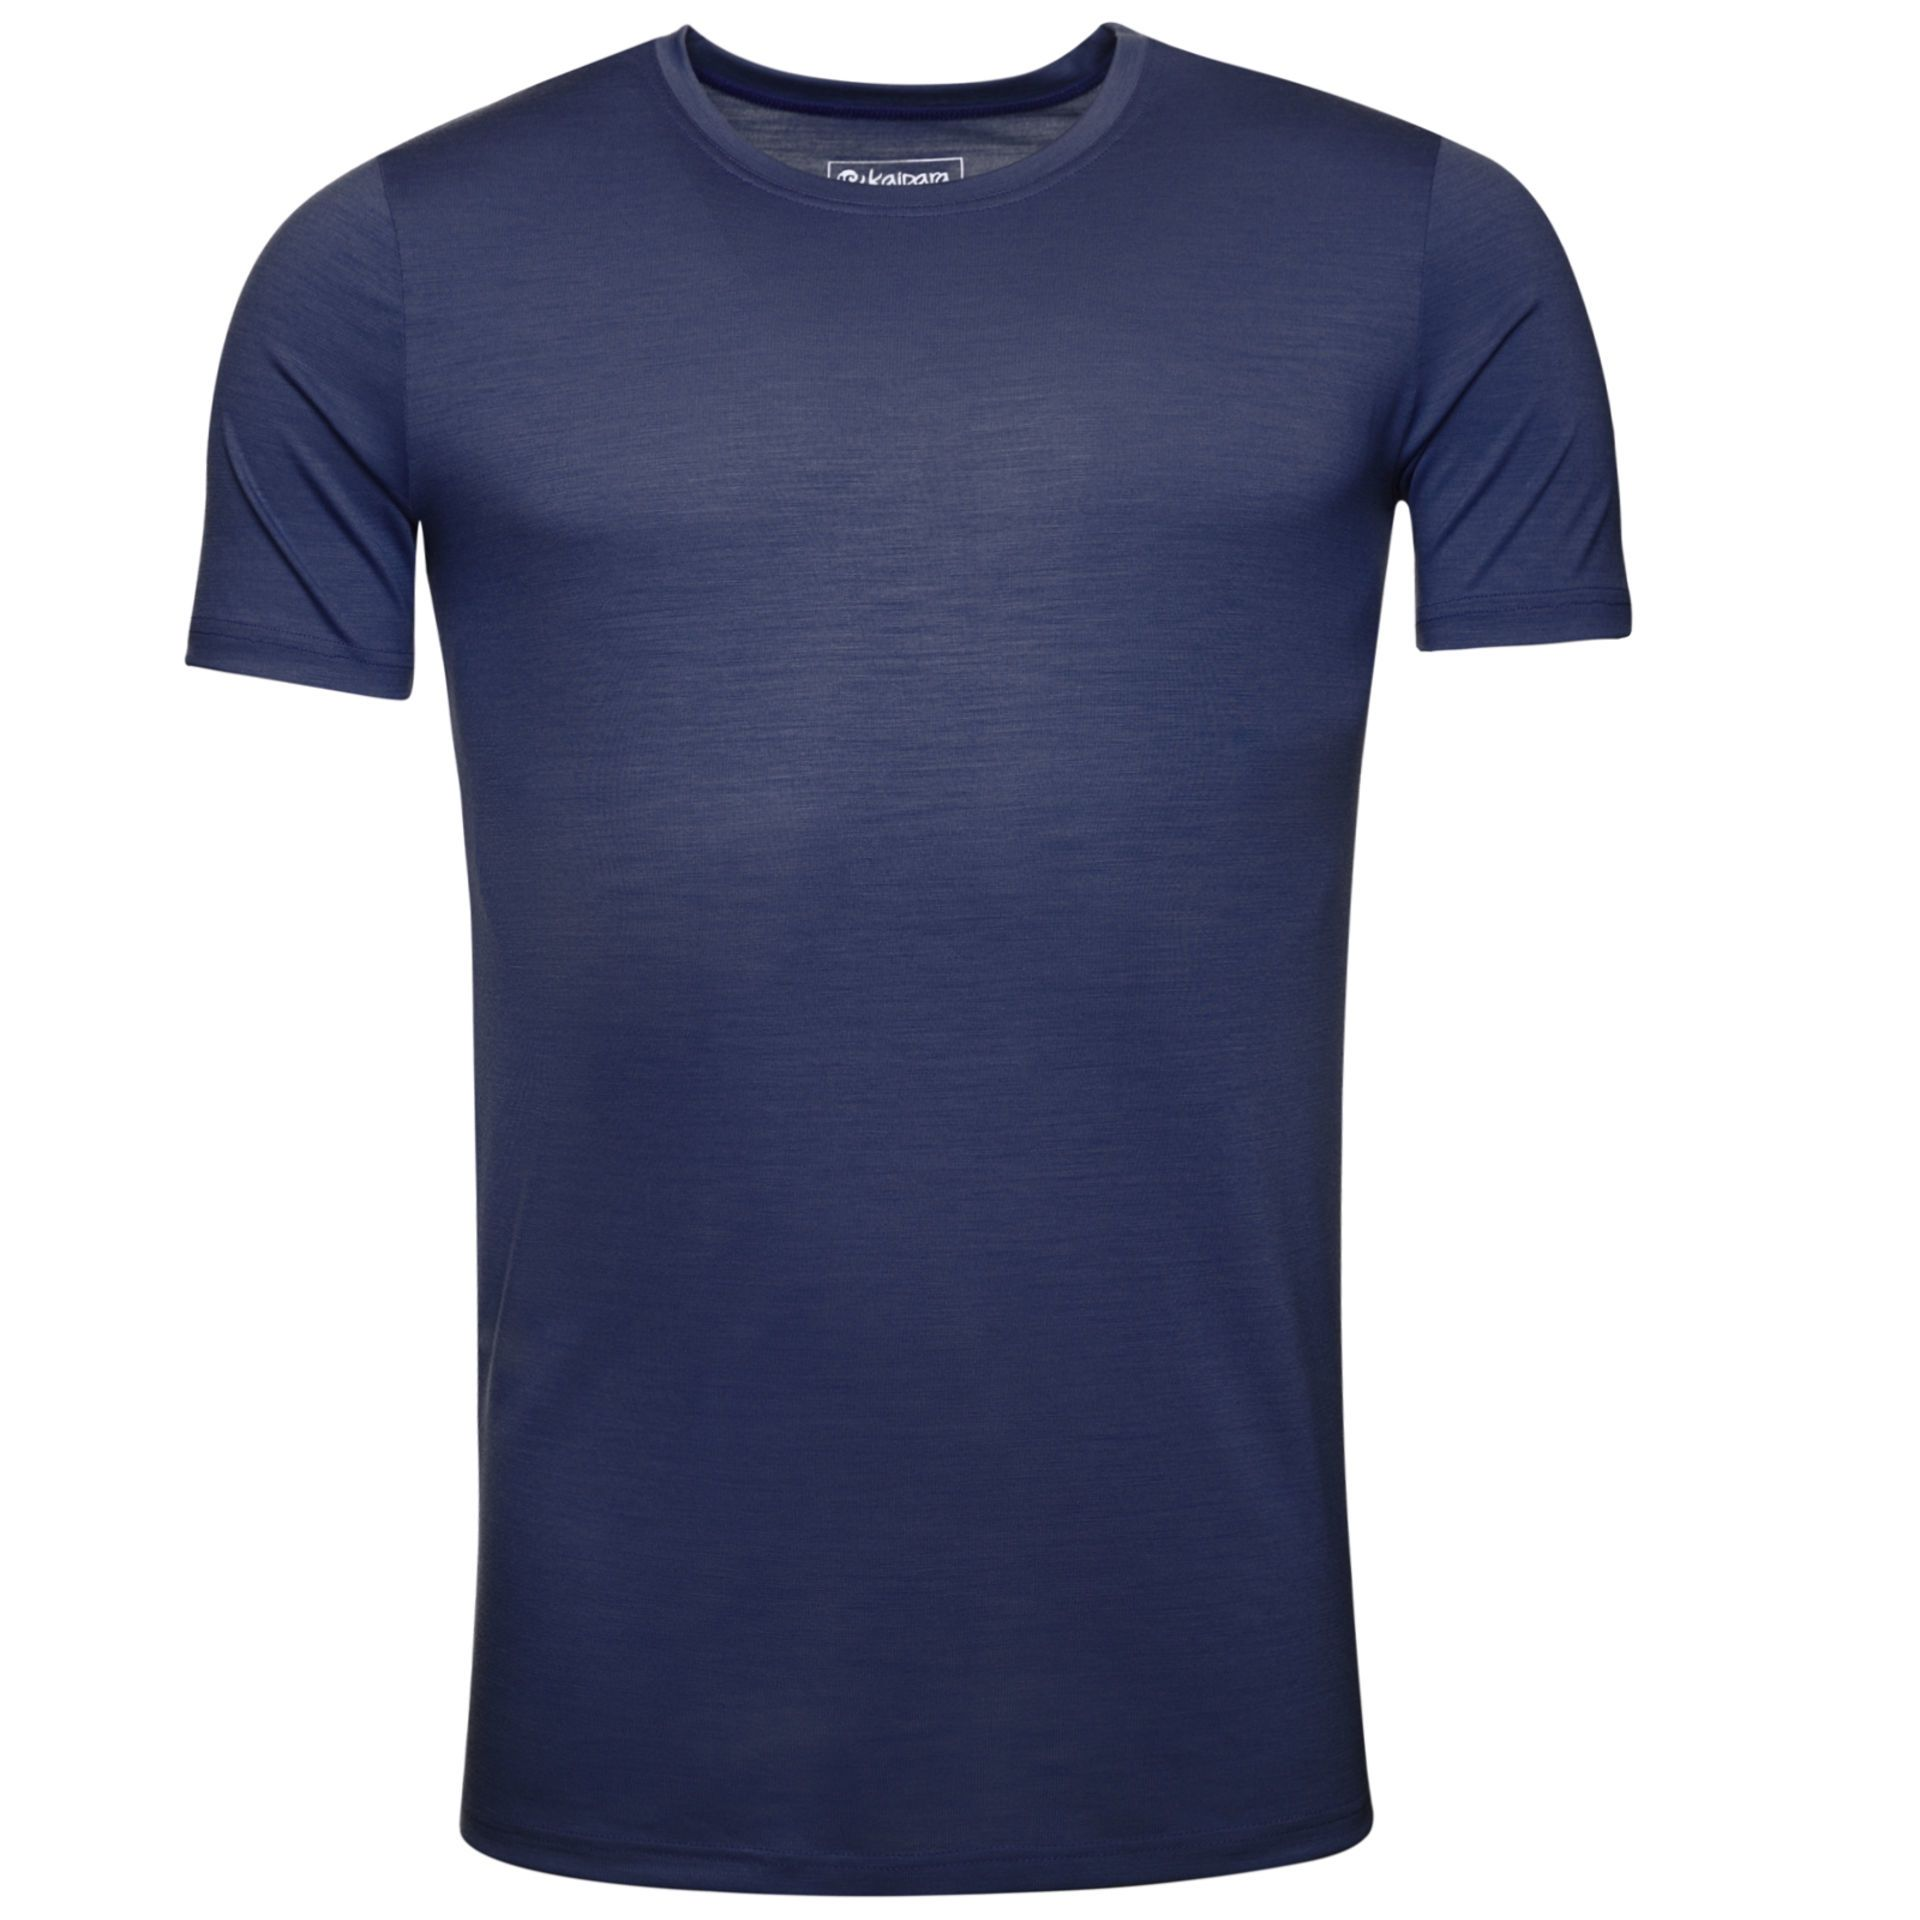 URBAN LIMITED Merino T-Shirt Herren Kurzarm Slimfit 200 Navy / L